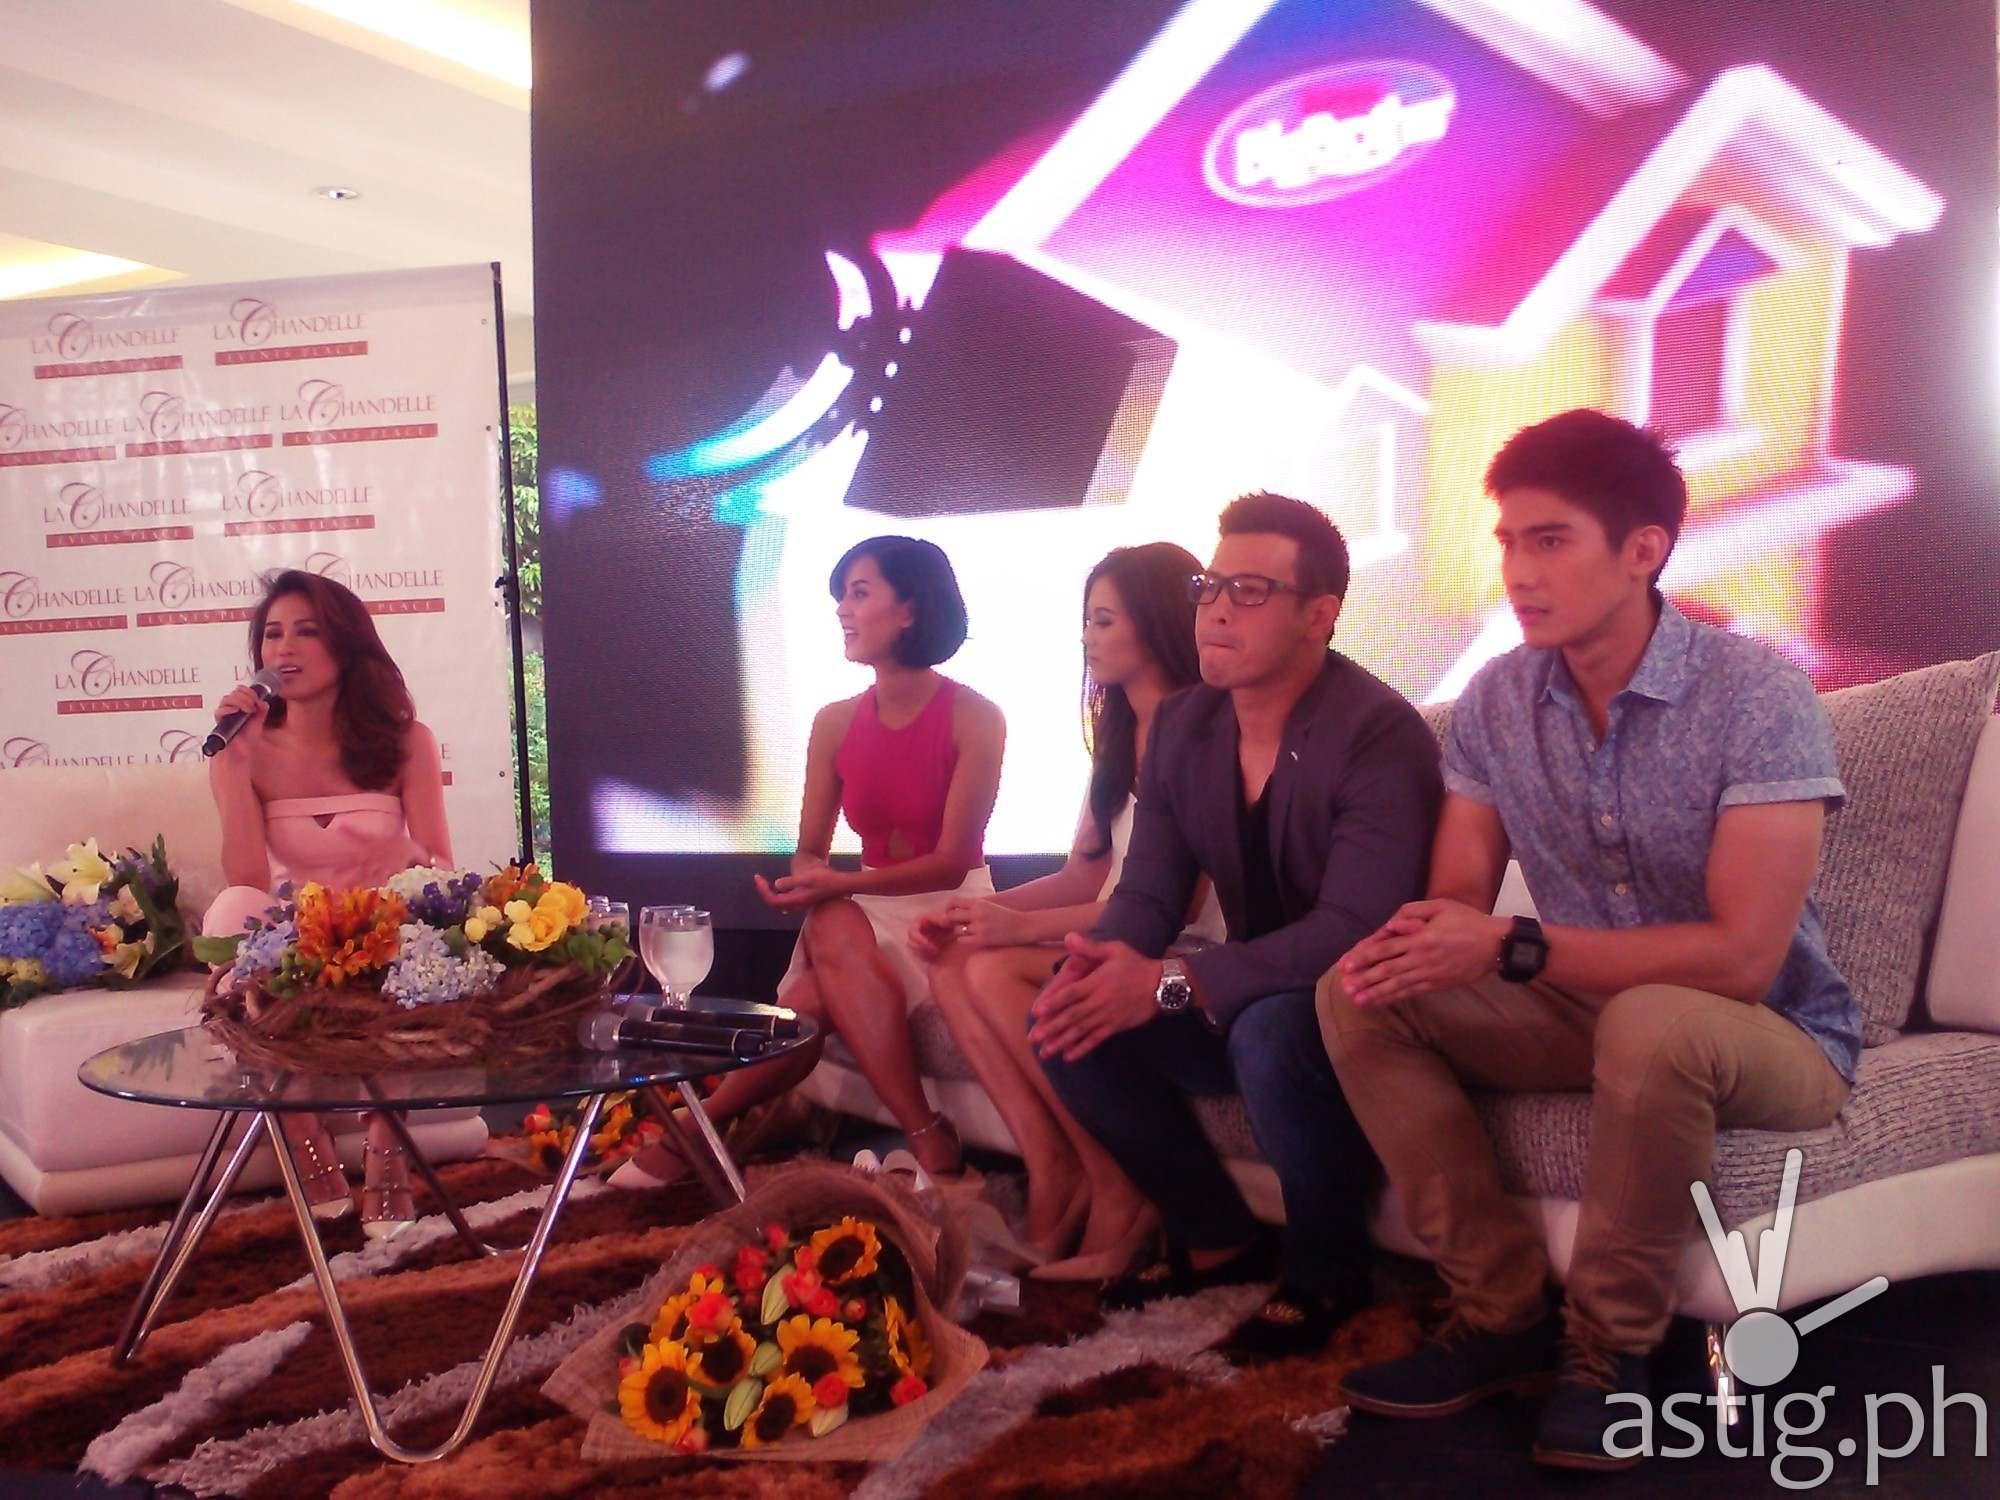 Pinoy Big Brother All In hosts Toni Gonzaga, Bianca Gonzales, Alex Gonzaga, John Prats, and Robi Domingo